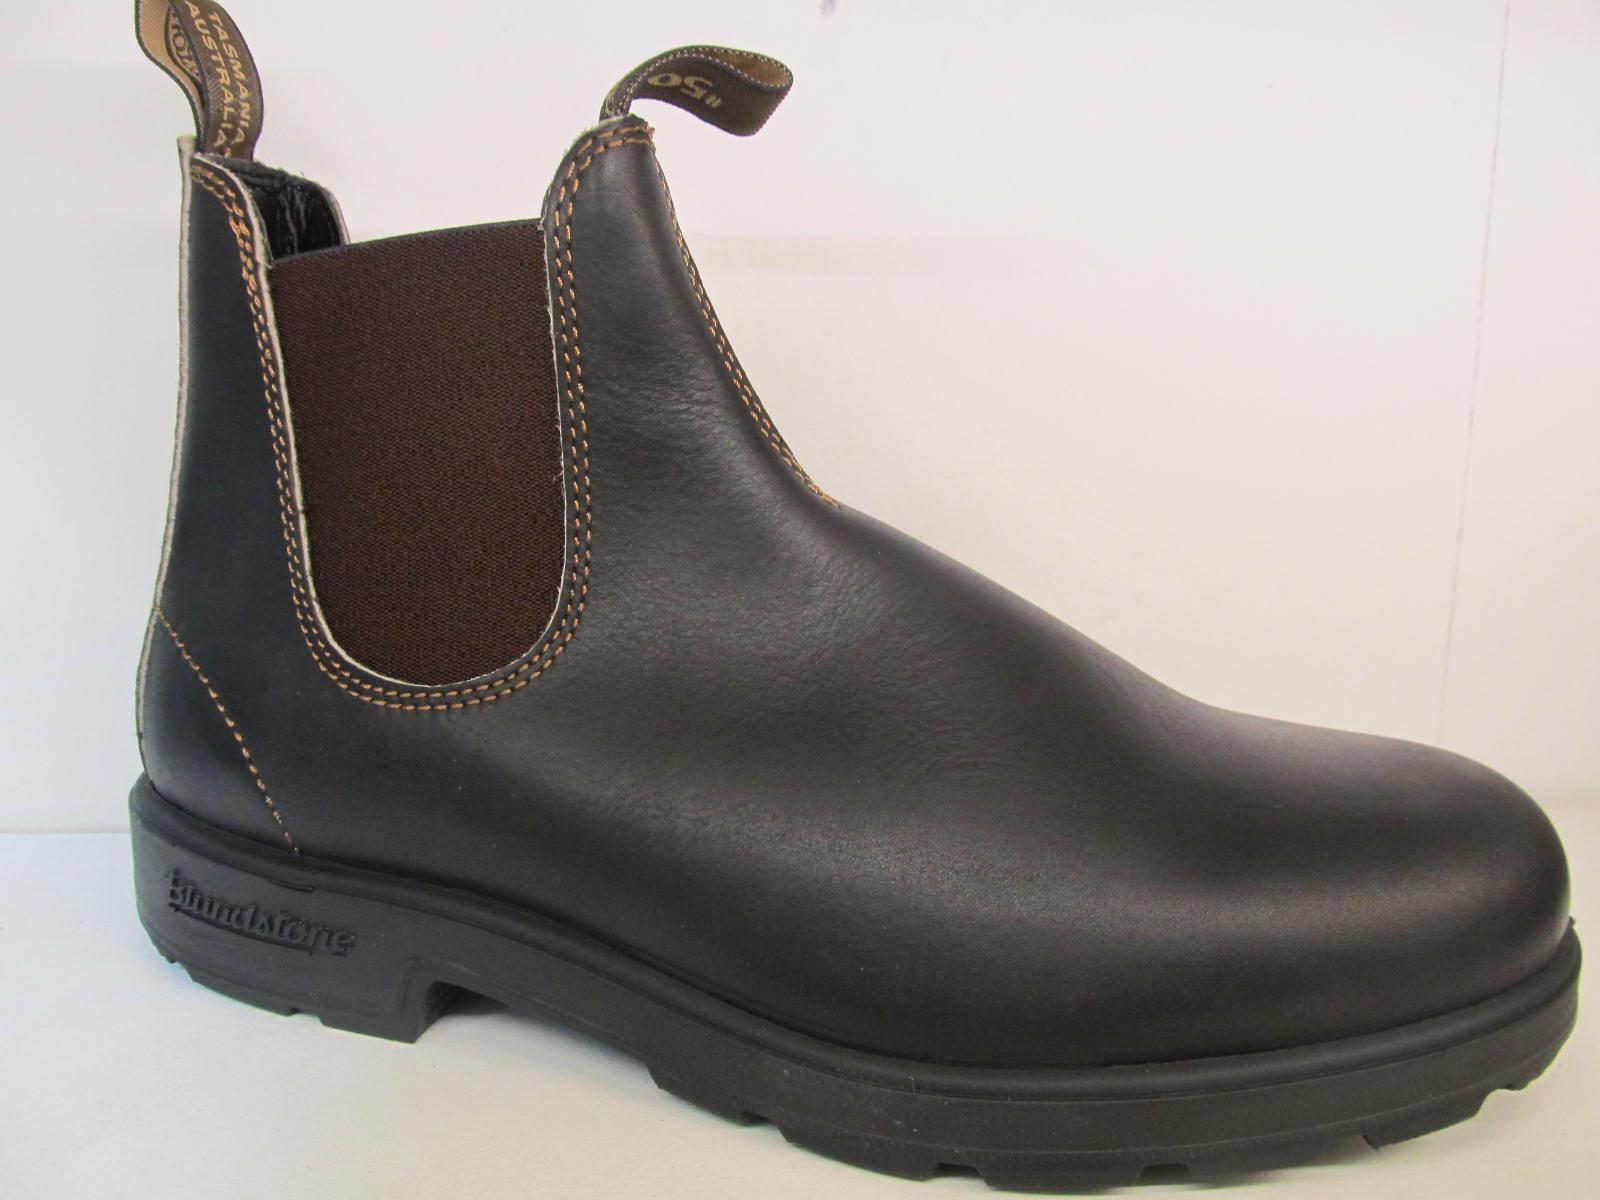 8a419404 azulndstone 500 Stout Marrón Cuero Chelsea Tobillo Elástica cara V Corte  Bota Zapato